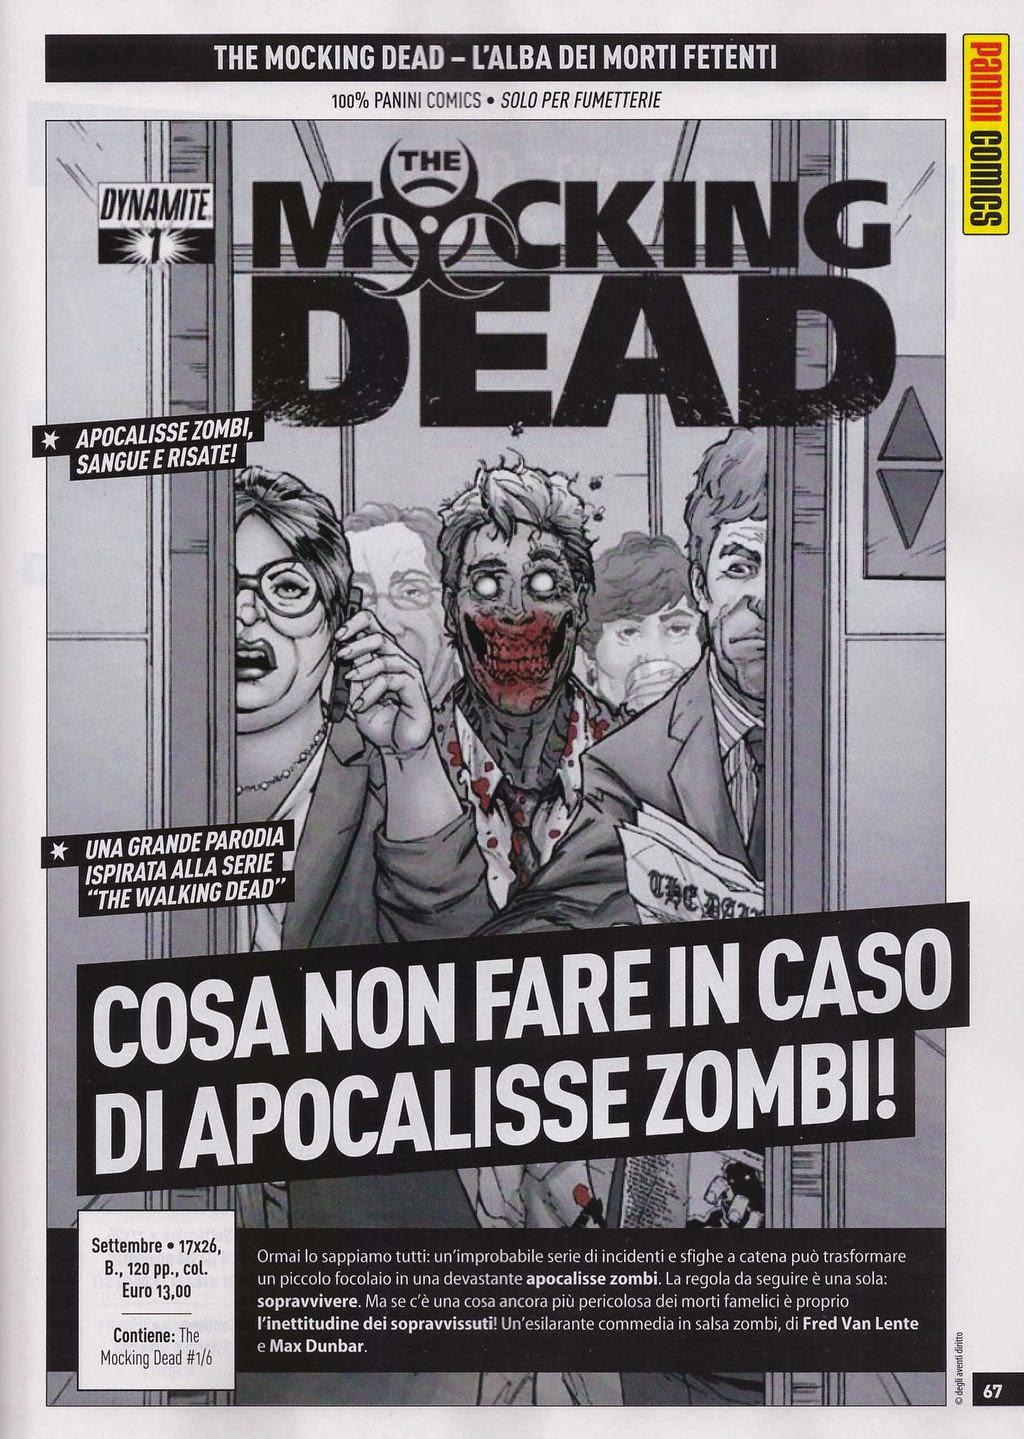 The Mocking Dead (PaniniComics)